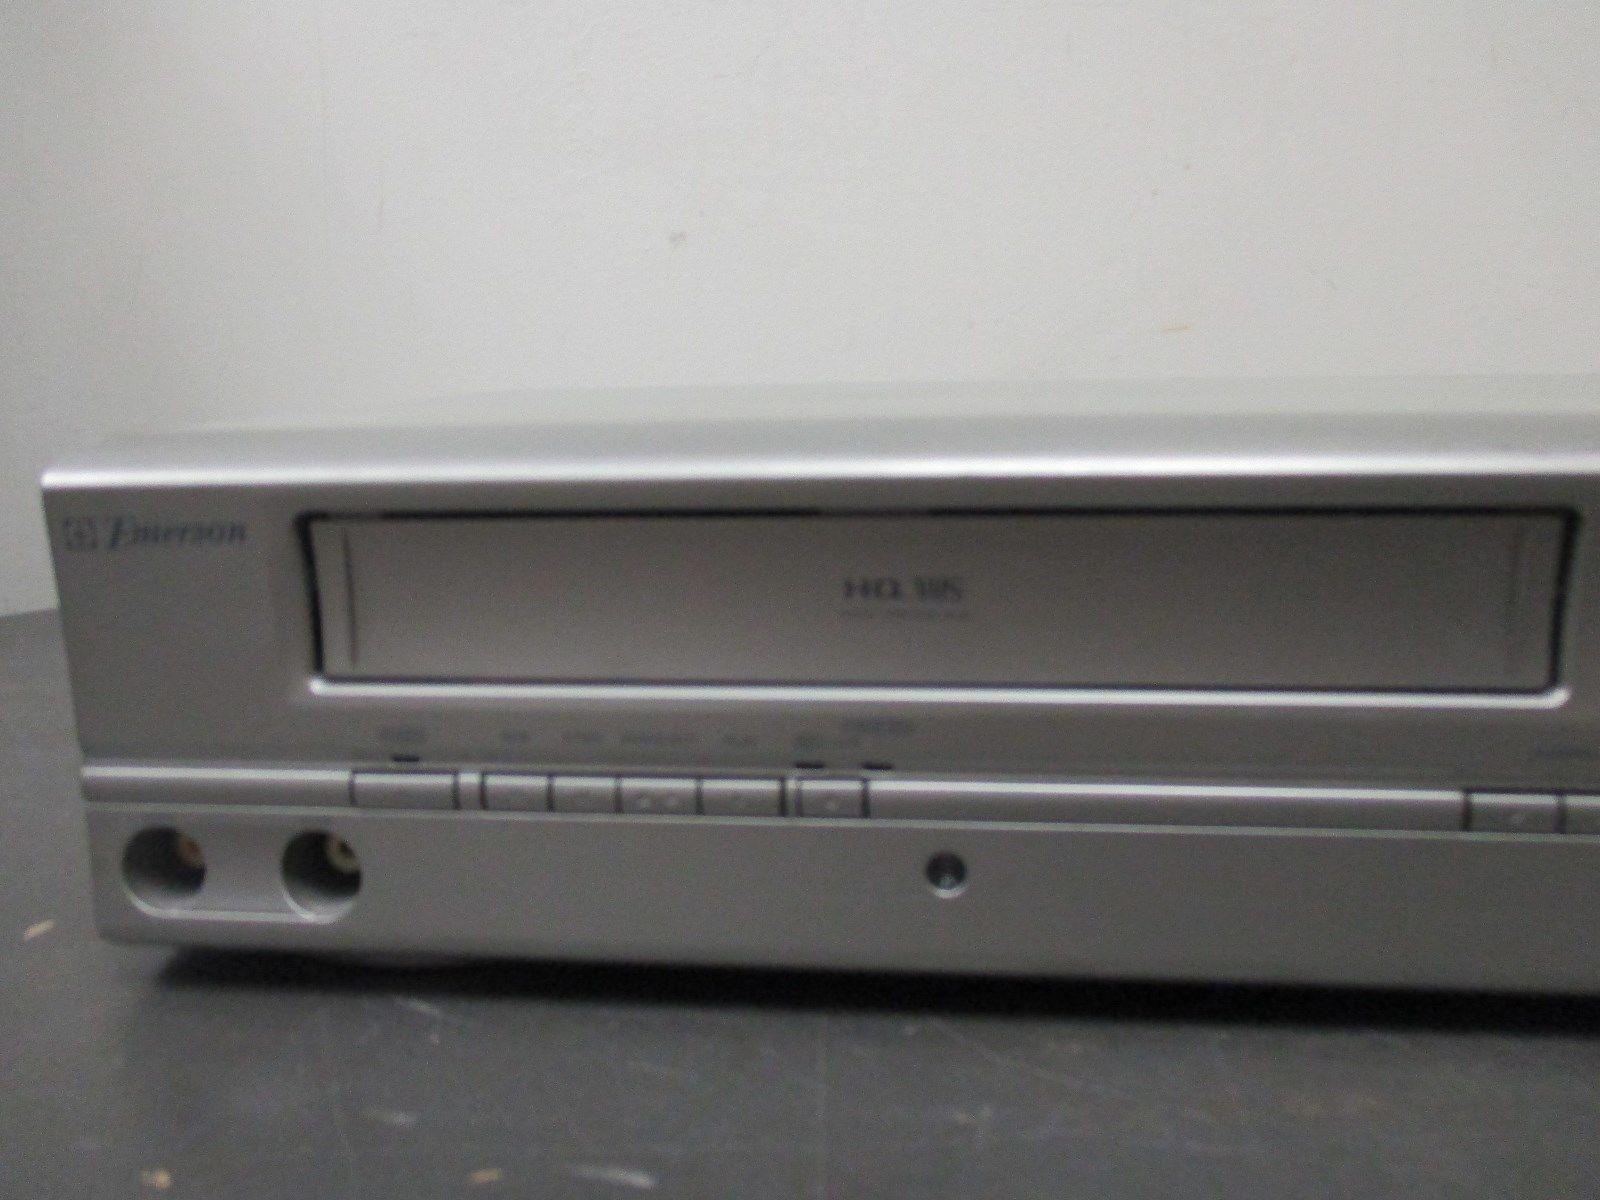 emerson ewd2004 dvd vcr player vhs combo and 13 similar items rh bonanza com Emerson DVD VCR Combo Emerson TV Logo